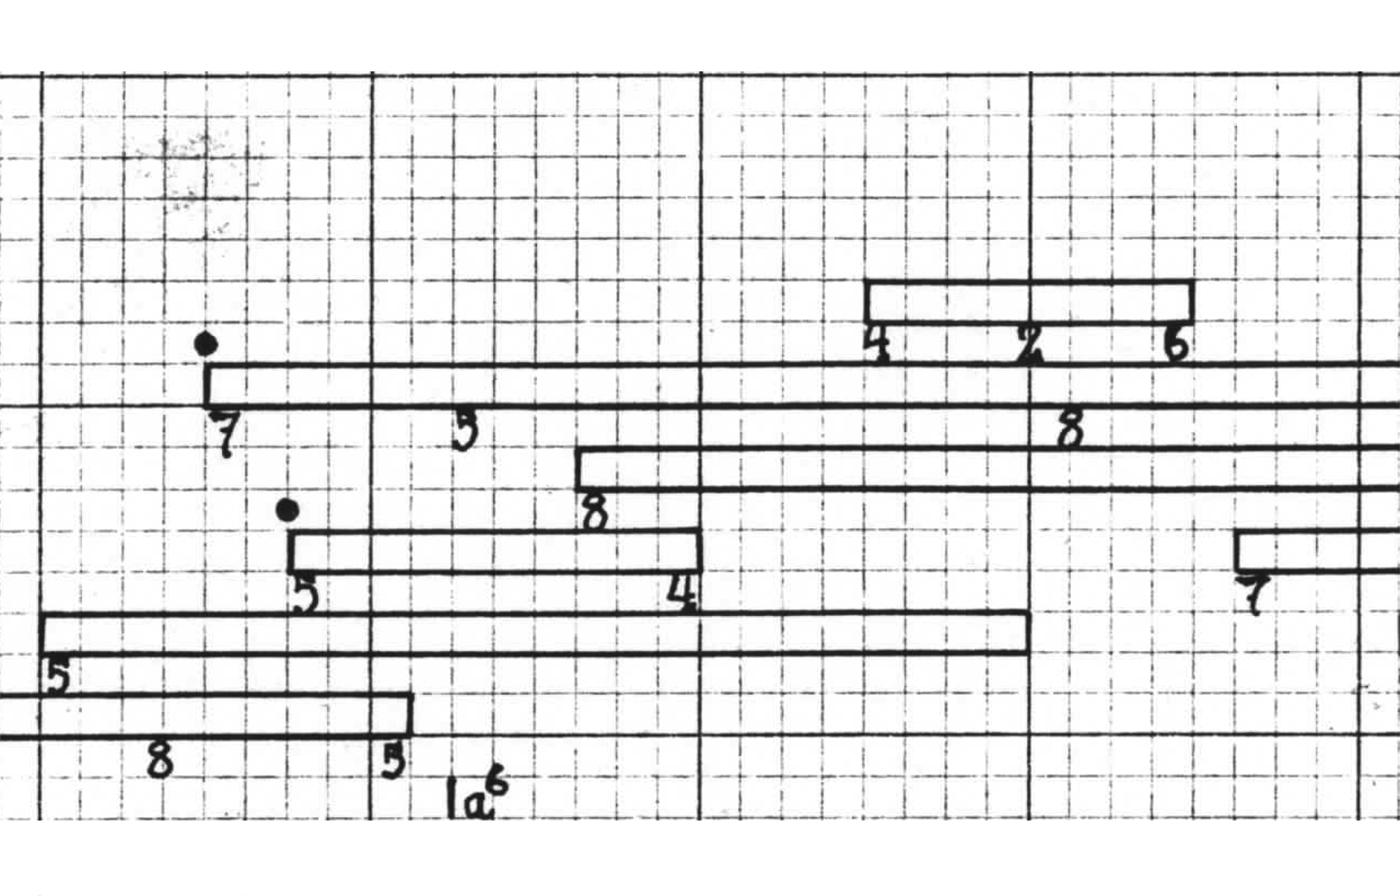 Excerpt of the  Imaginary Landscape No. 5  score.